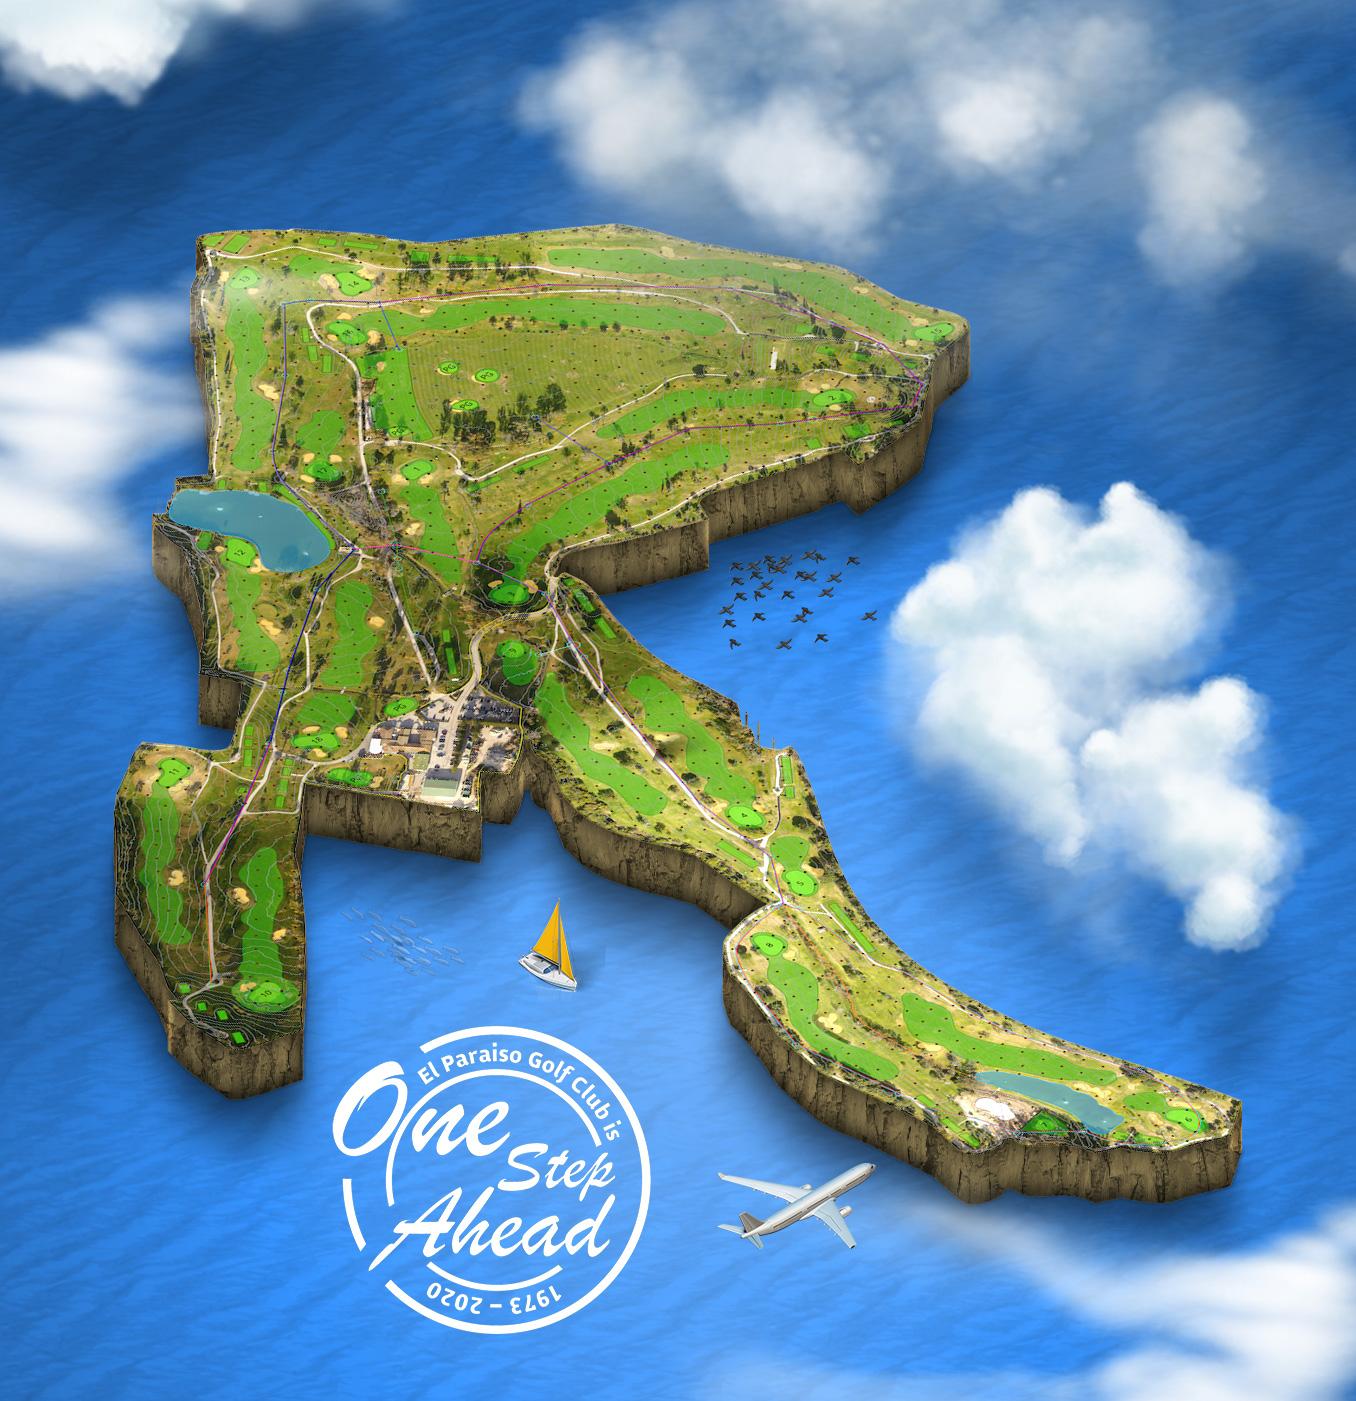 El Paraiso Golf is one step ahead